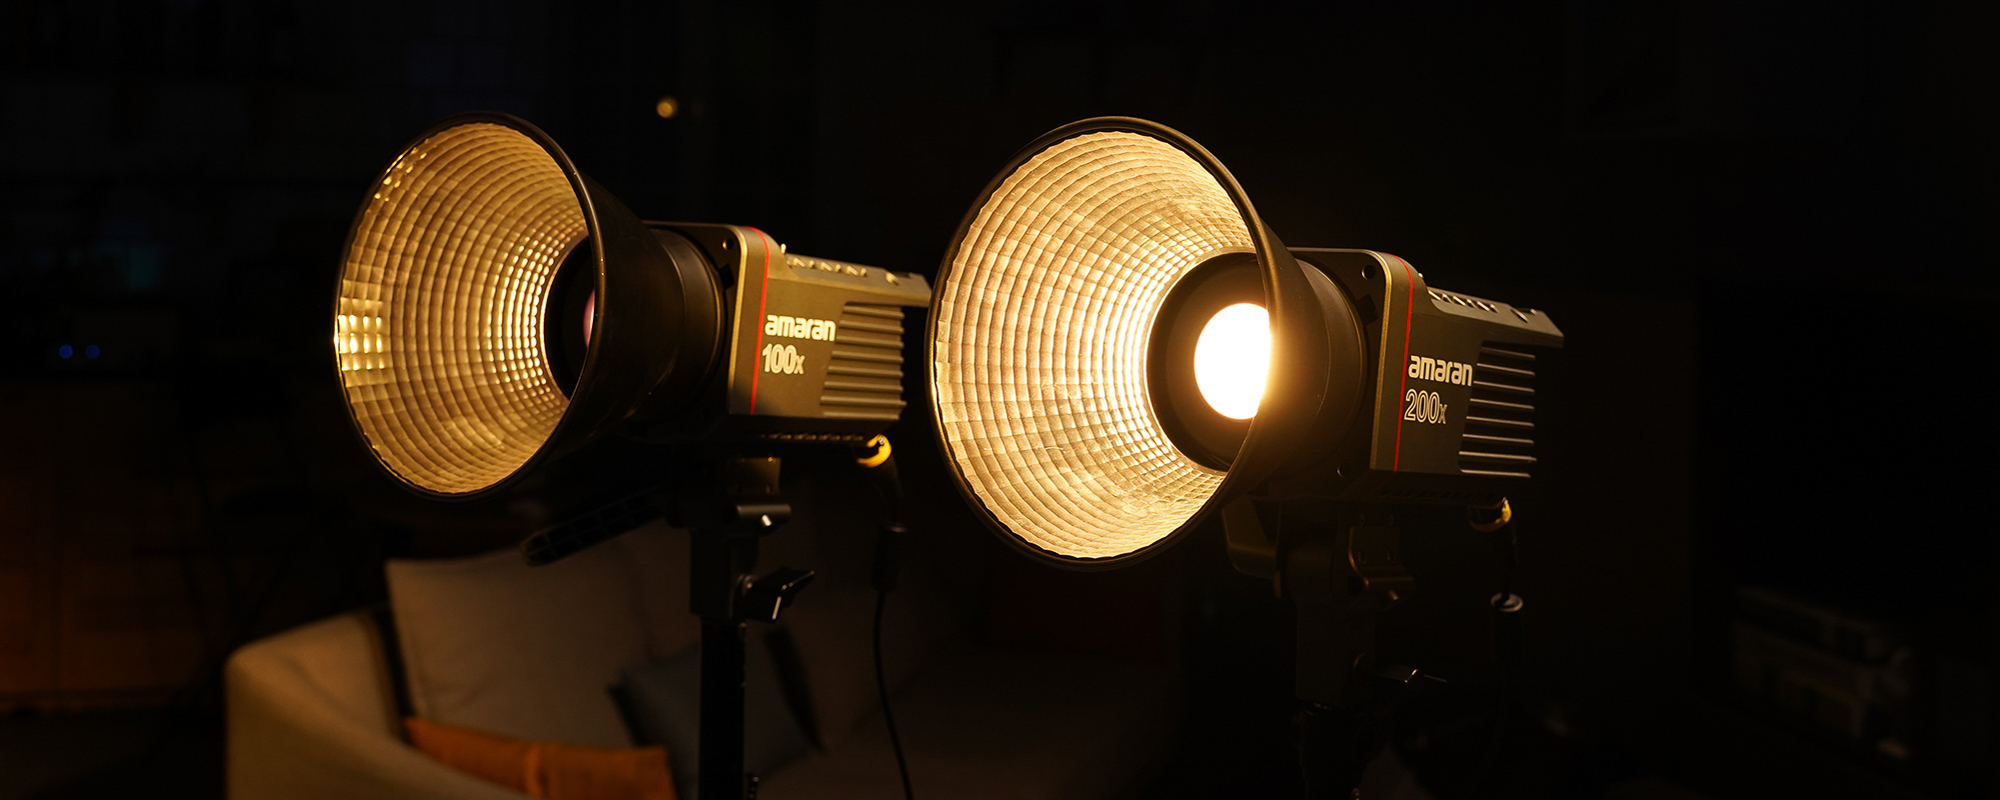 Lampa LED Amaran 200d - FX